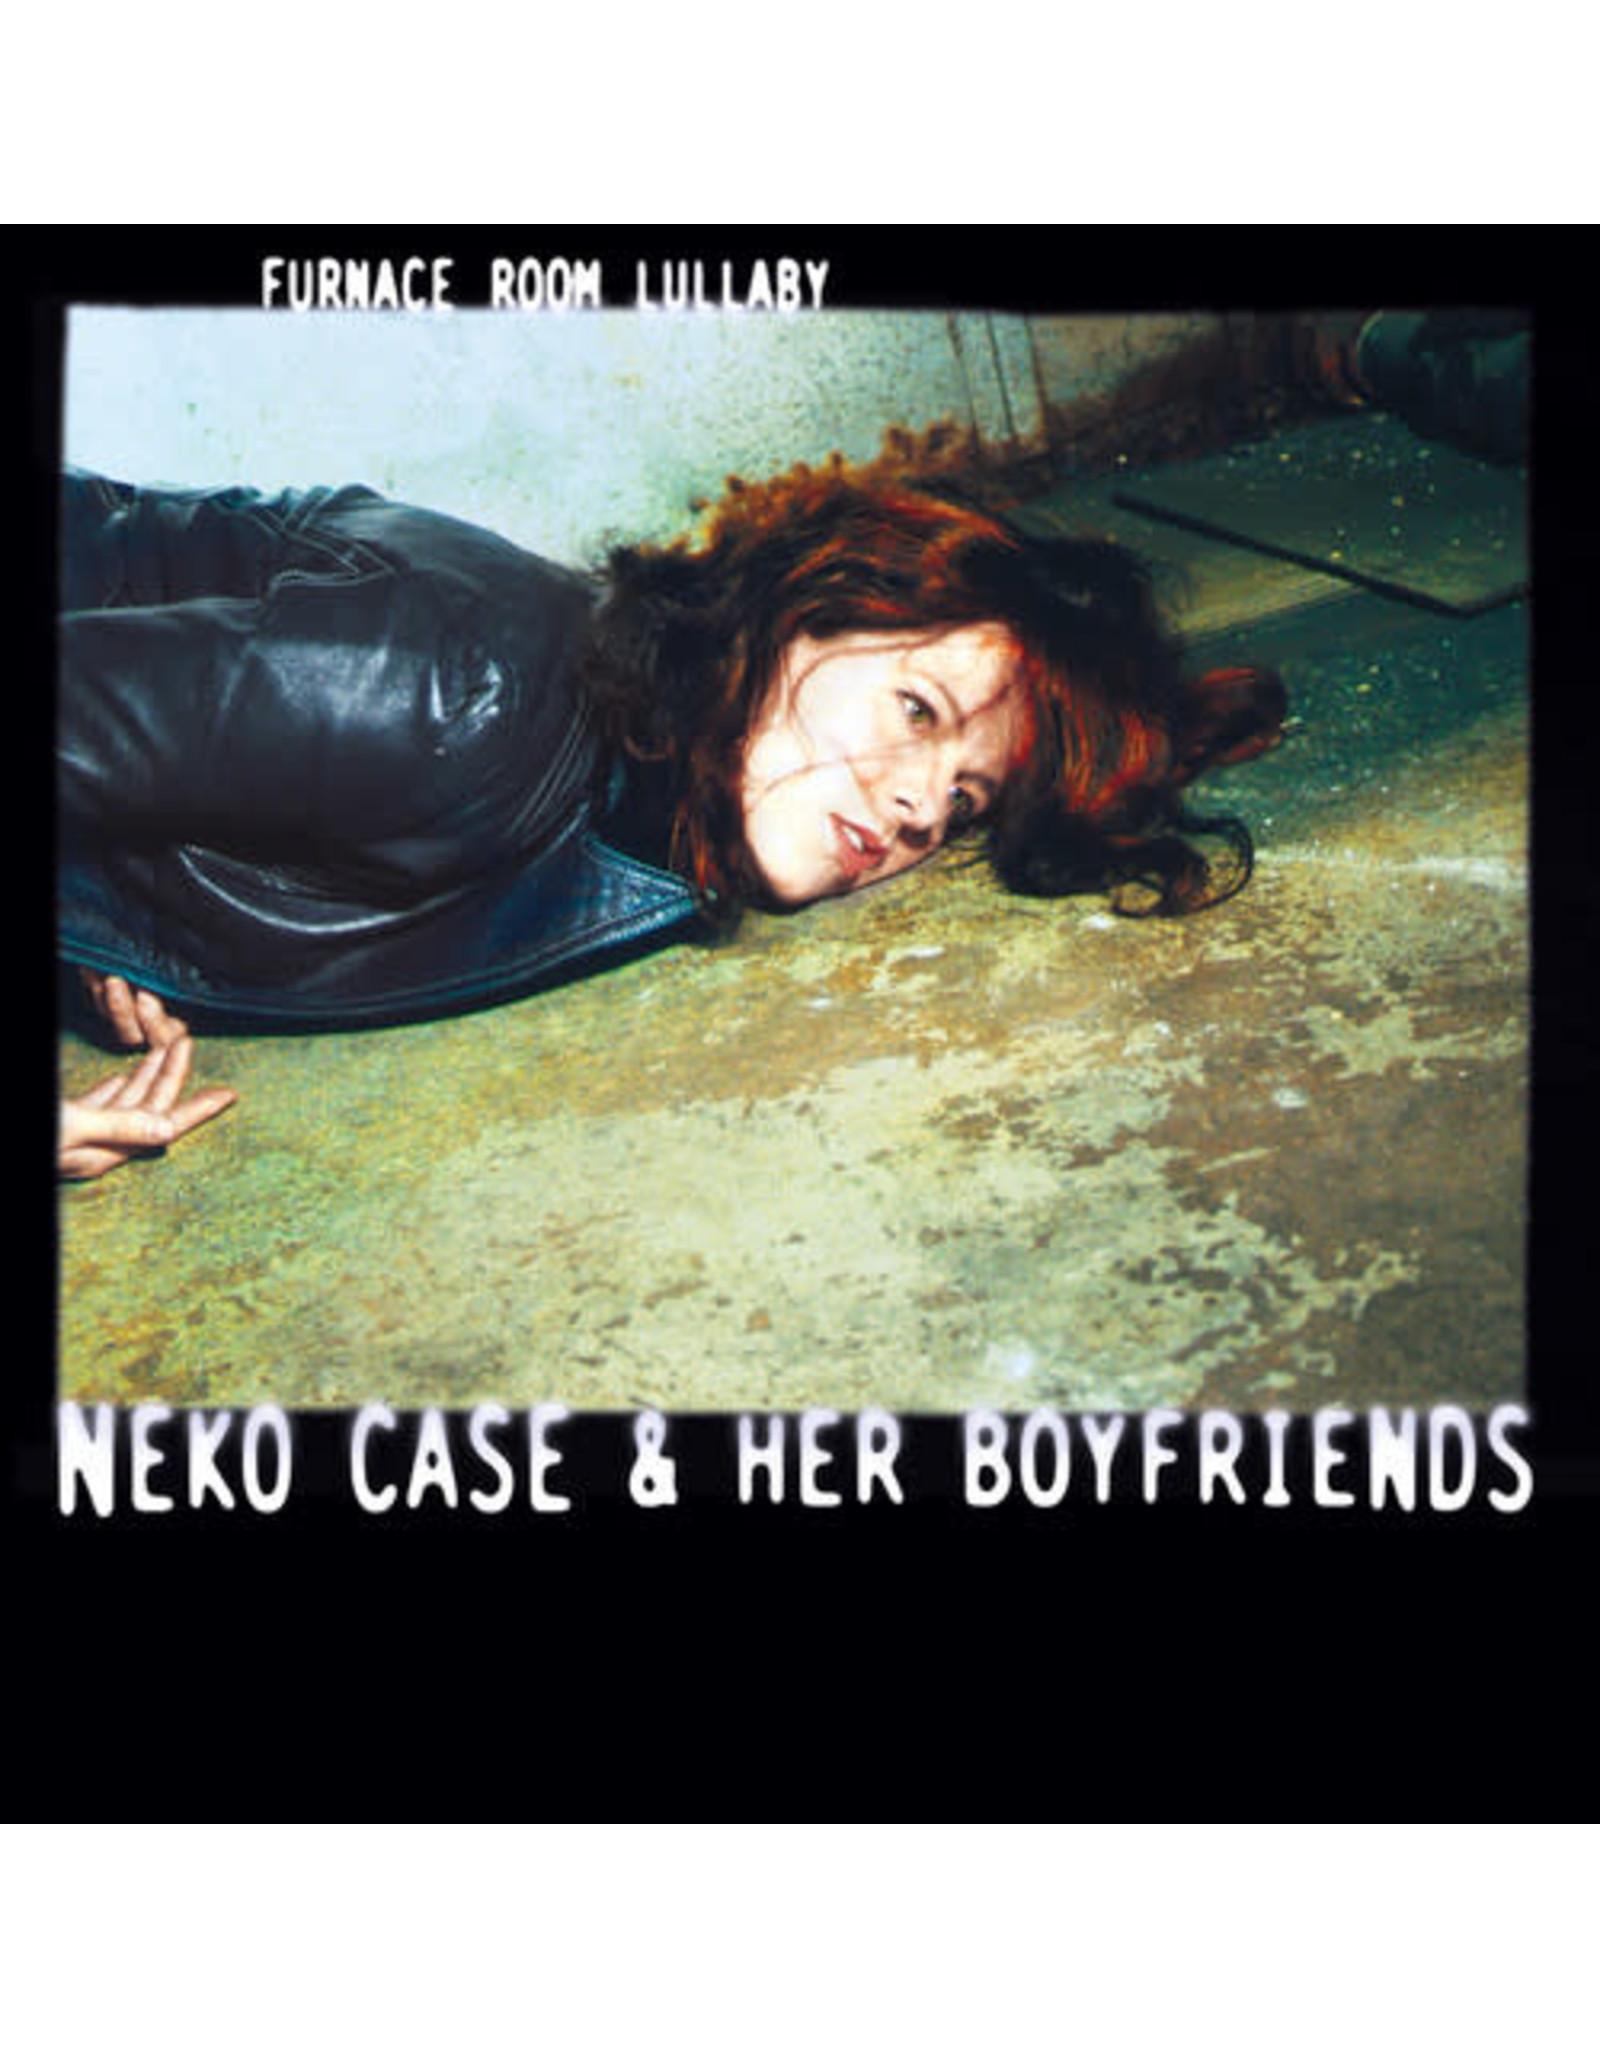 New Vinyl Neko Case - Furnace Room Lullaby (20th Anniversary, Colored) LP